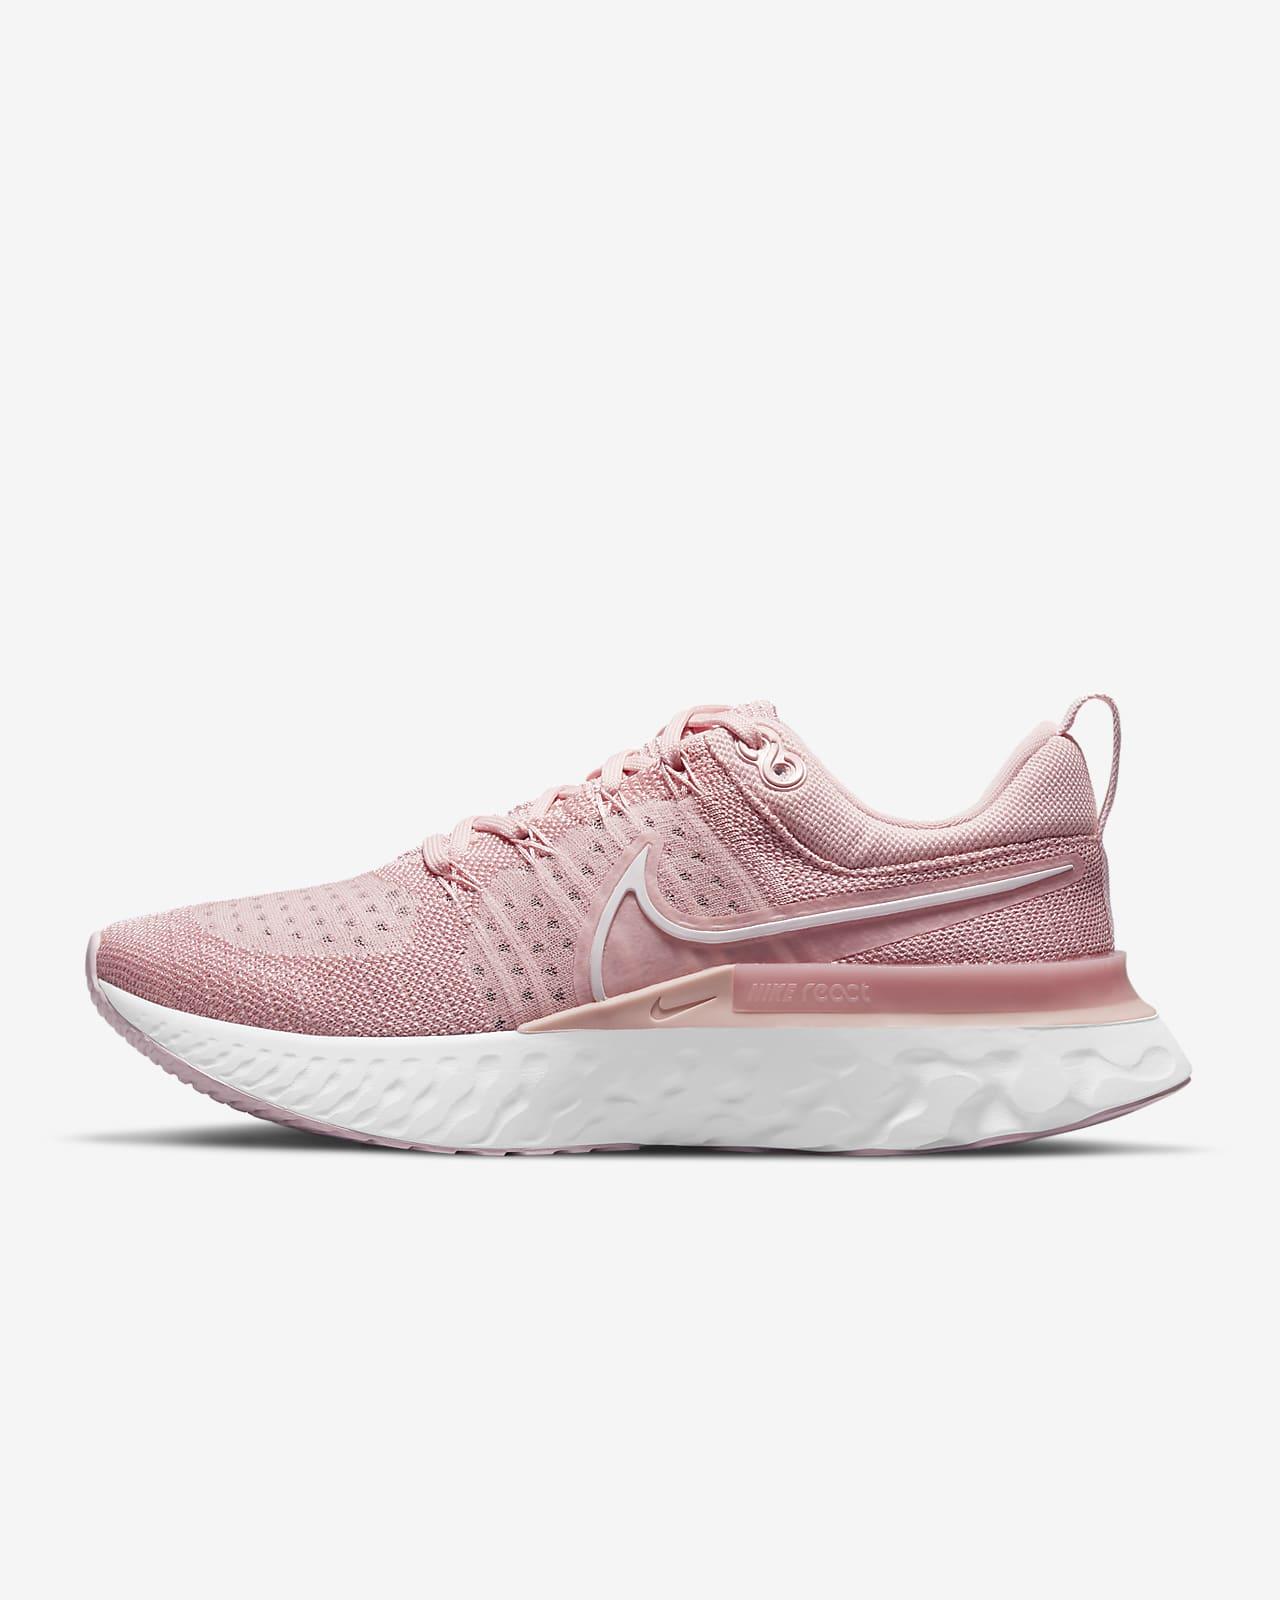 Nike React Infinity Run Flyknit 2 Straßenlaufschuh für Damen